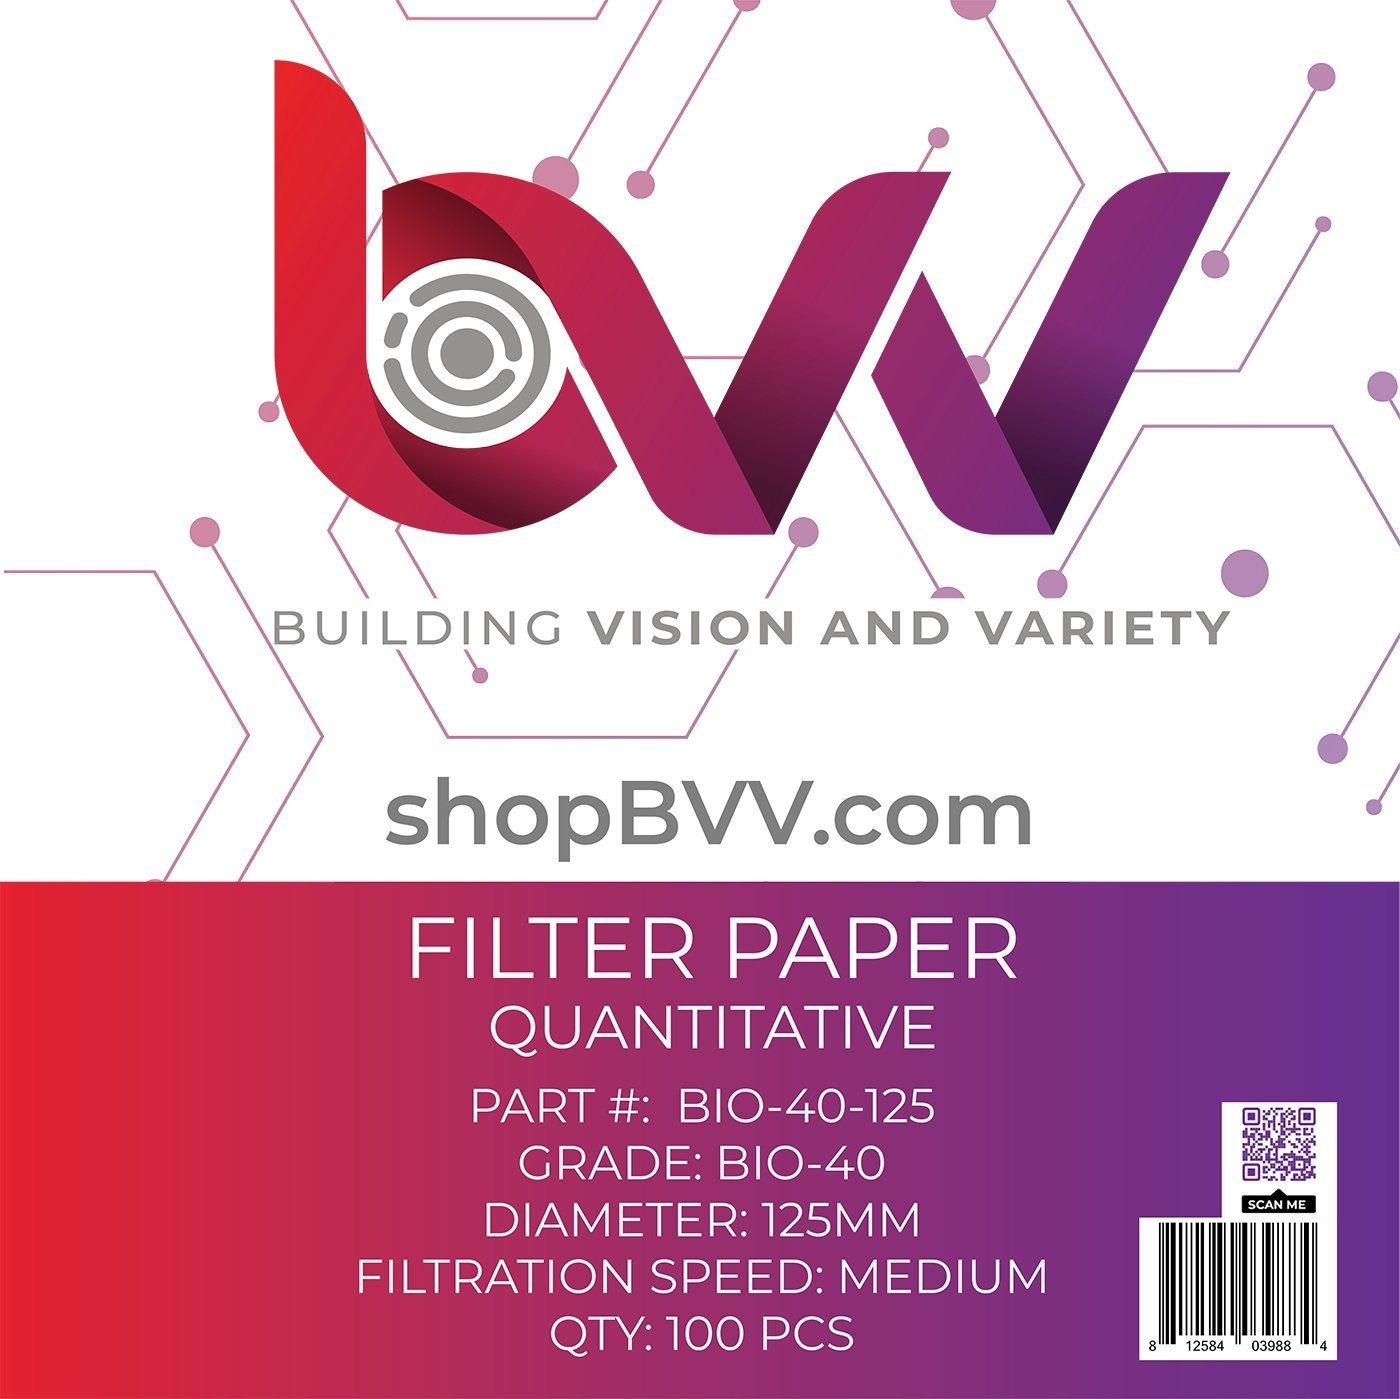 Generic Ashless Filter Papers - 125MM - Quantitative